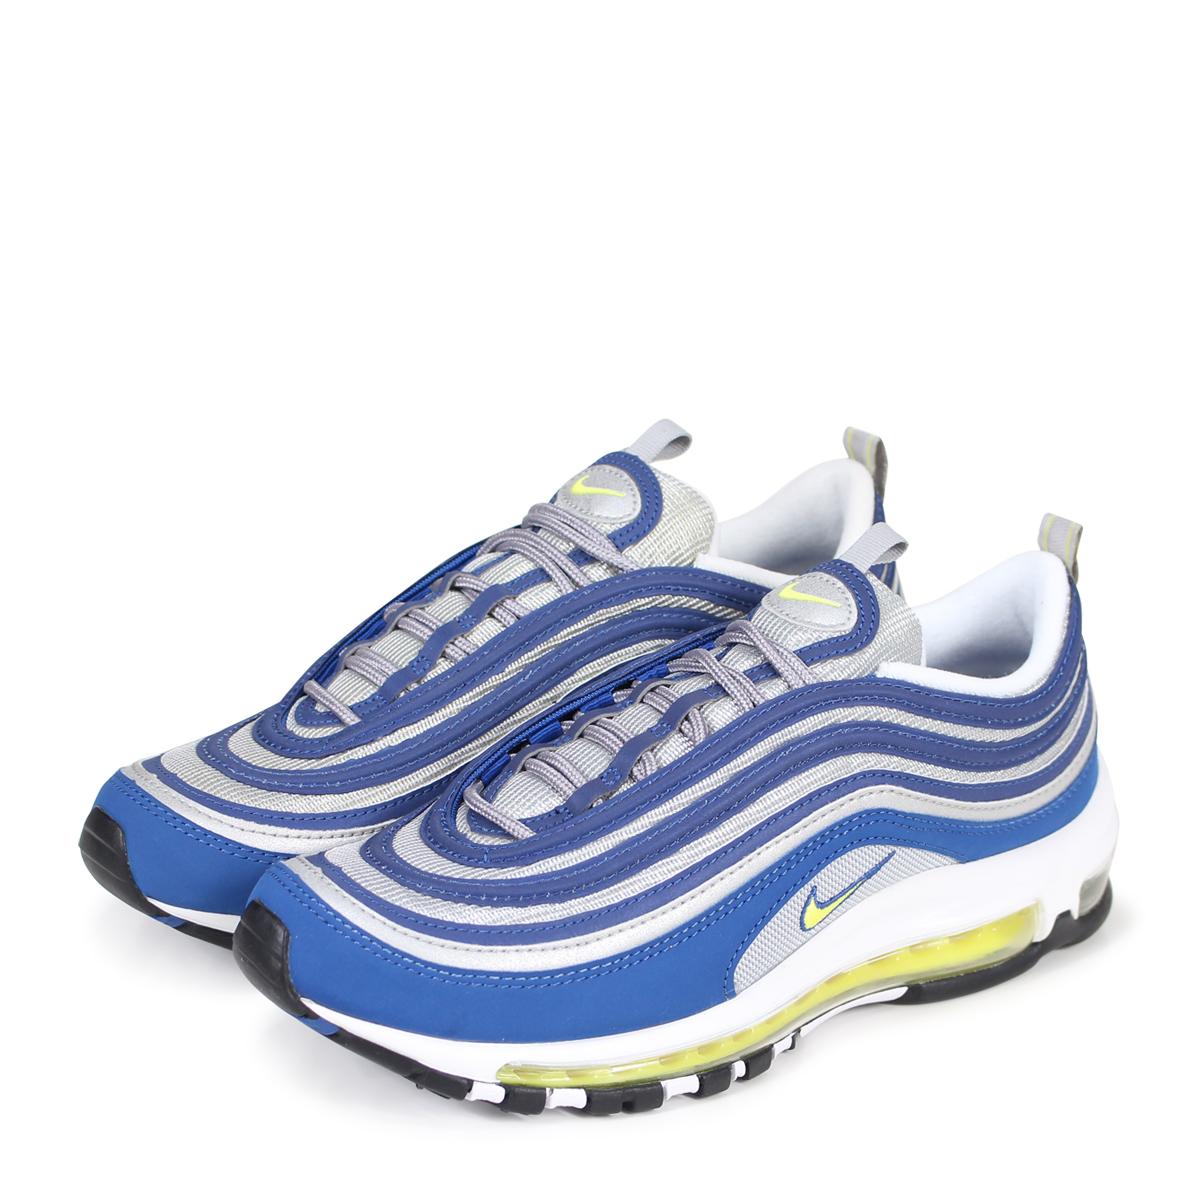 473dc6b31f NIKE AIR MAX 97 ATLANTIC BLUE Kie Ney AMAX 97 sneakers men 921,826-401 blue  ...